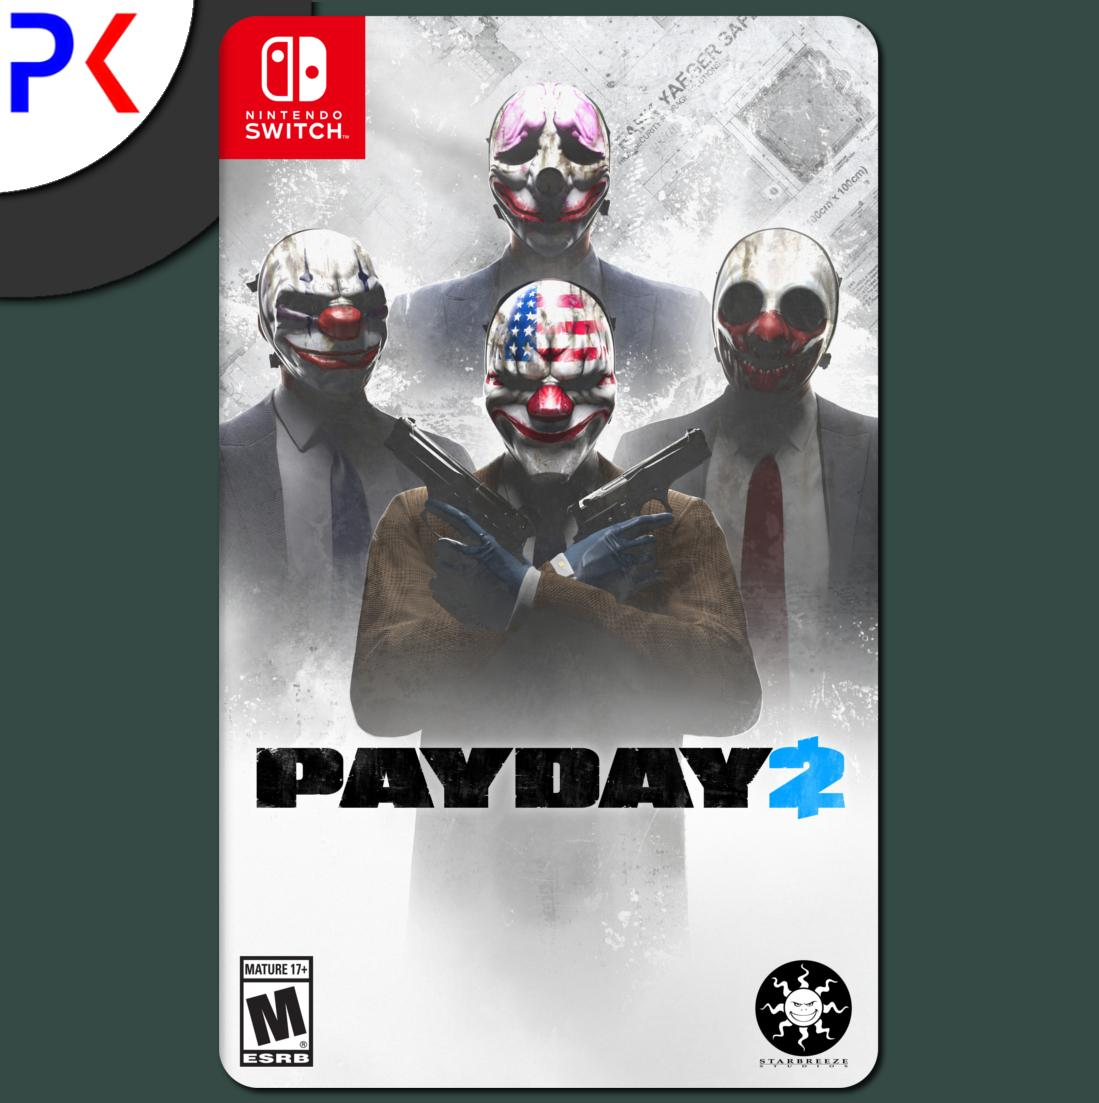 Nintendo Switch Payday 2 (US)